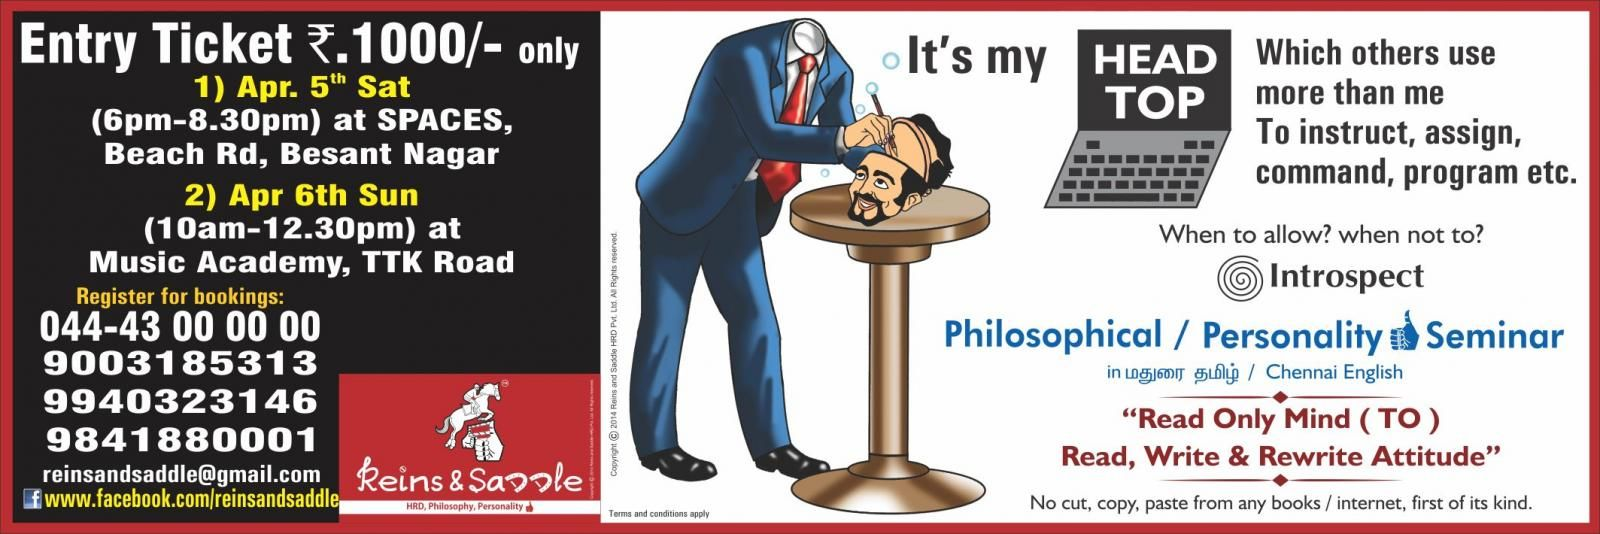 Philosophical / Personality Seminar